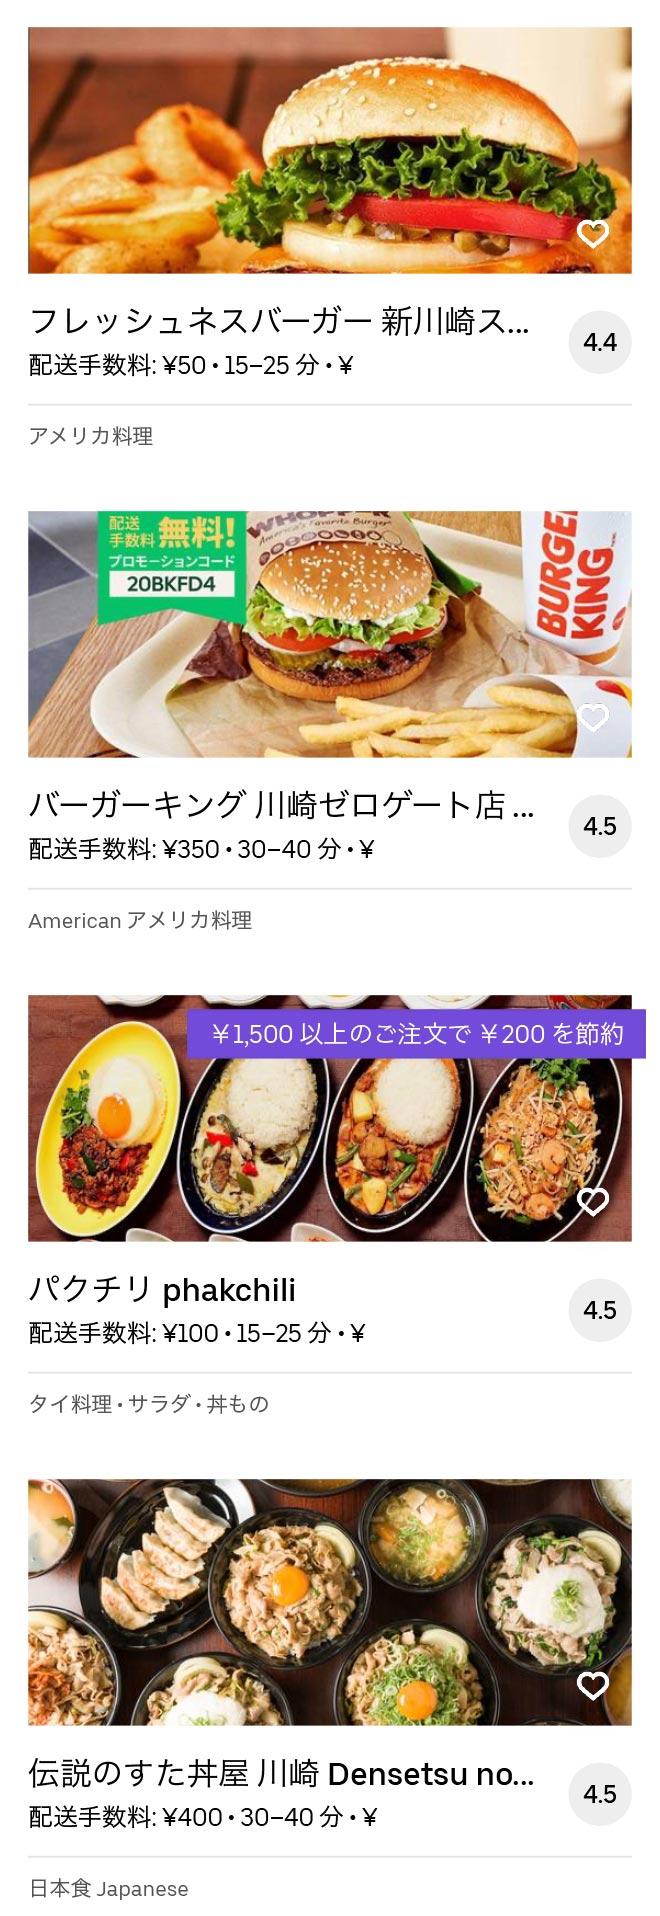 Shin kawasaki menu 2004 04